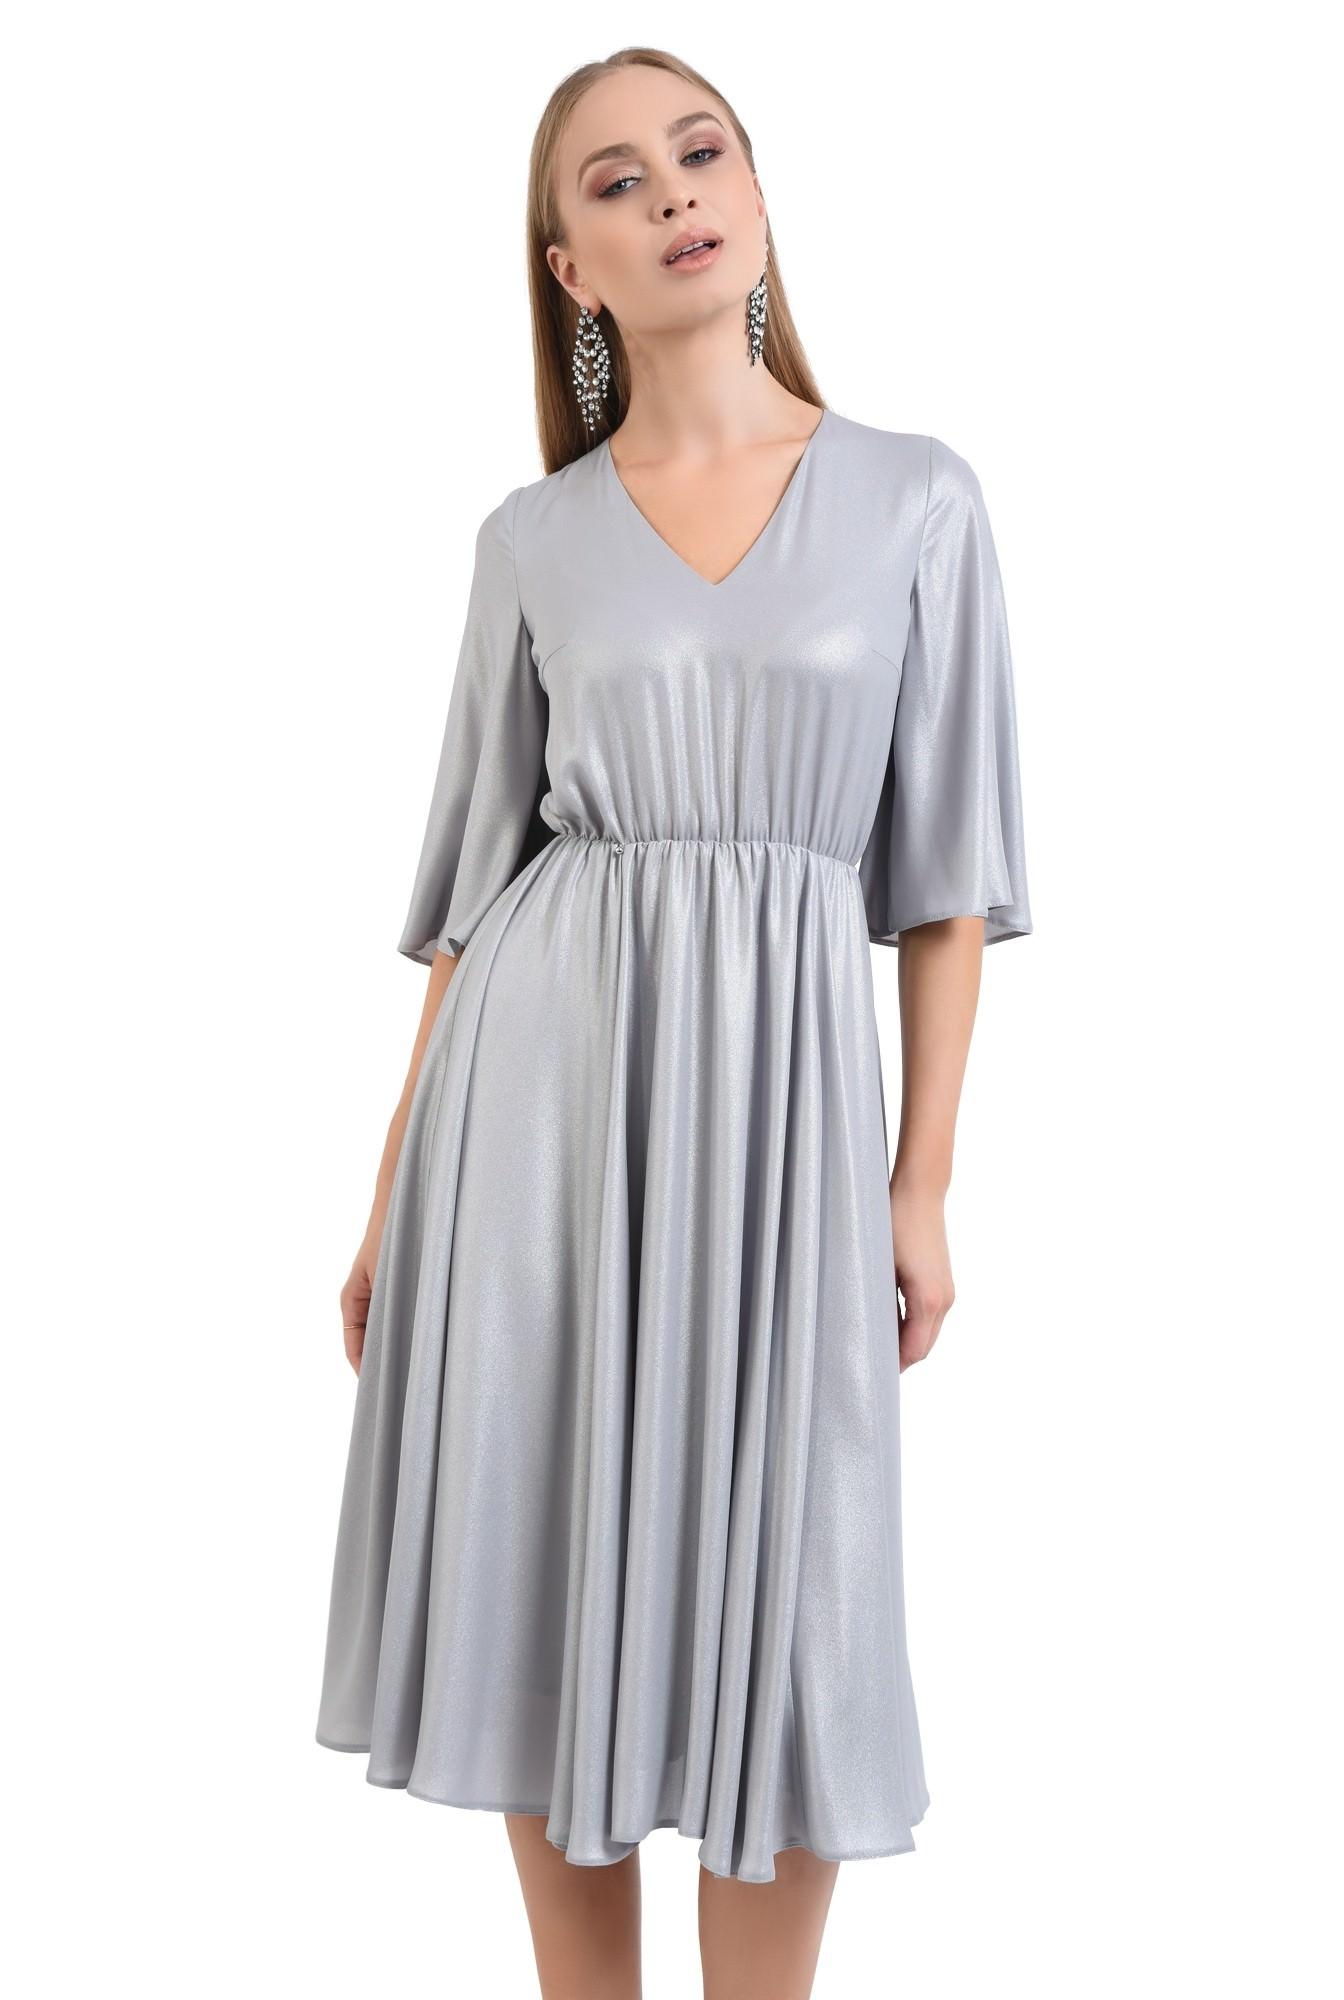 0 - rochie eleganta, clos, lurex, argintiu